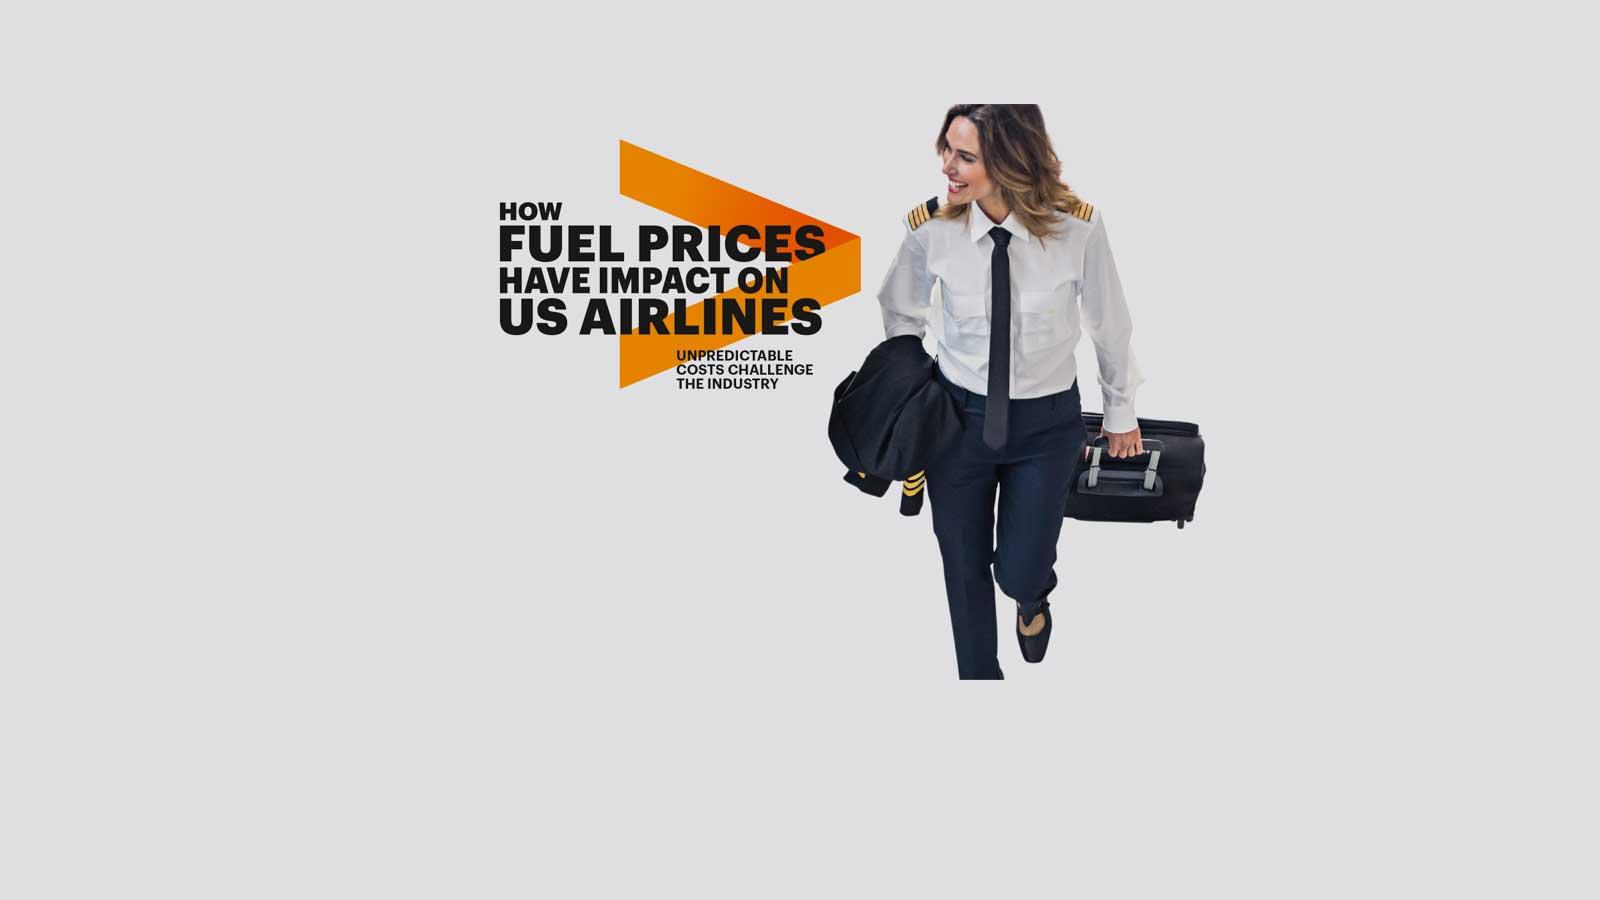 How Fuel Prices Impact US Airlines | Accenture